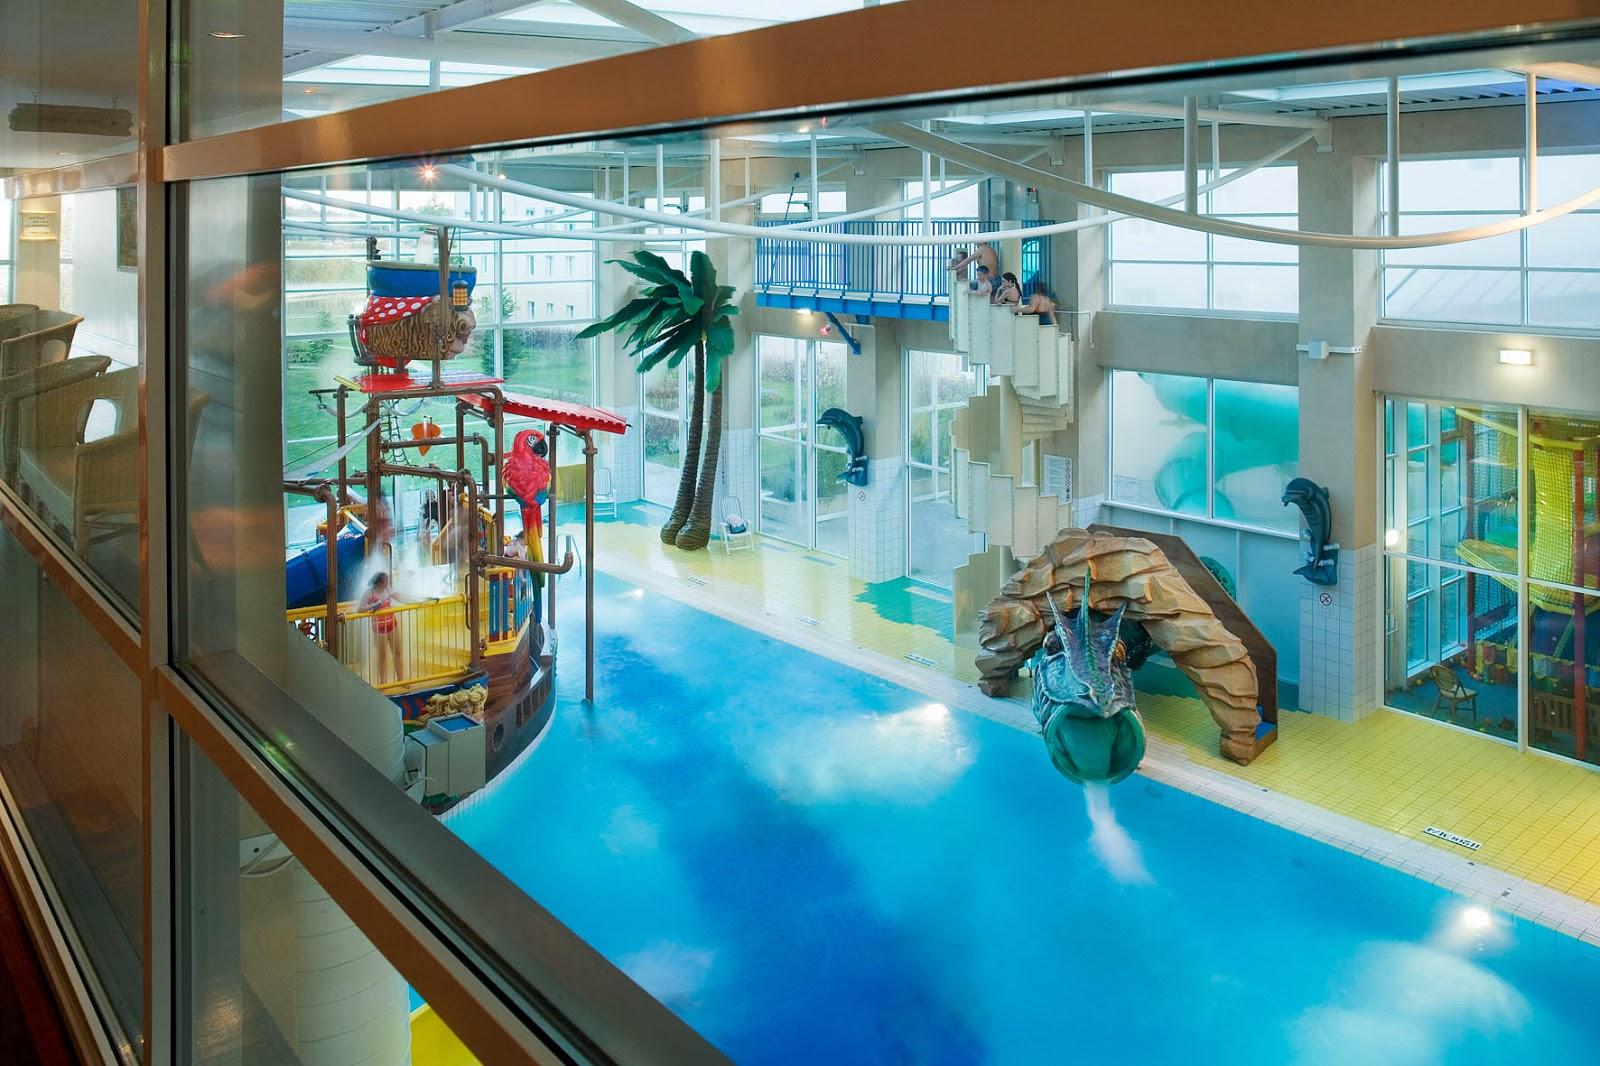 Hoteles para ni os magny le hongre francia hotel explorers algonquin - Hotel piscina toboganes para ninos ...